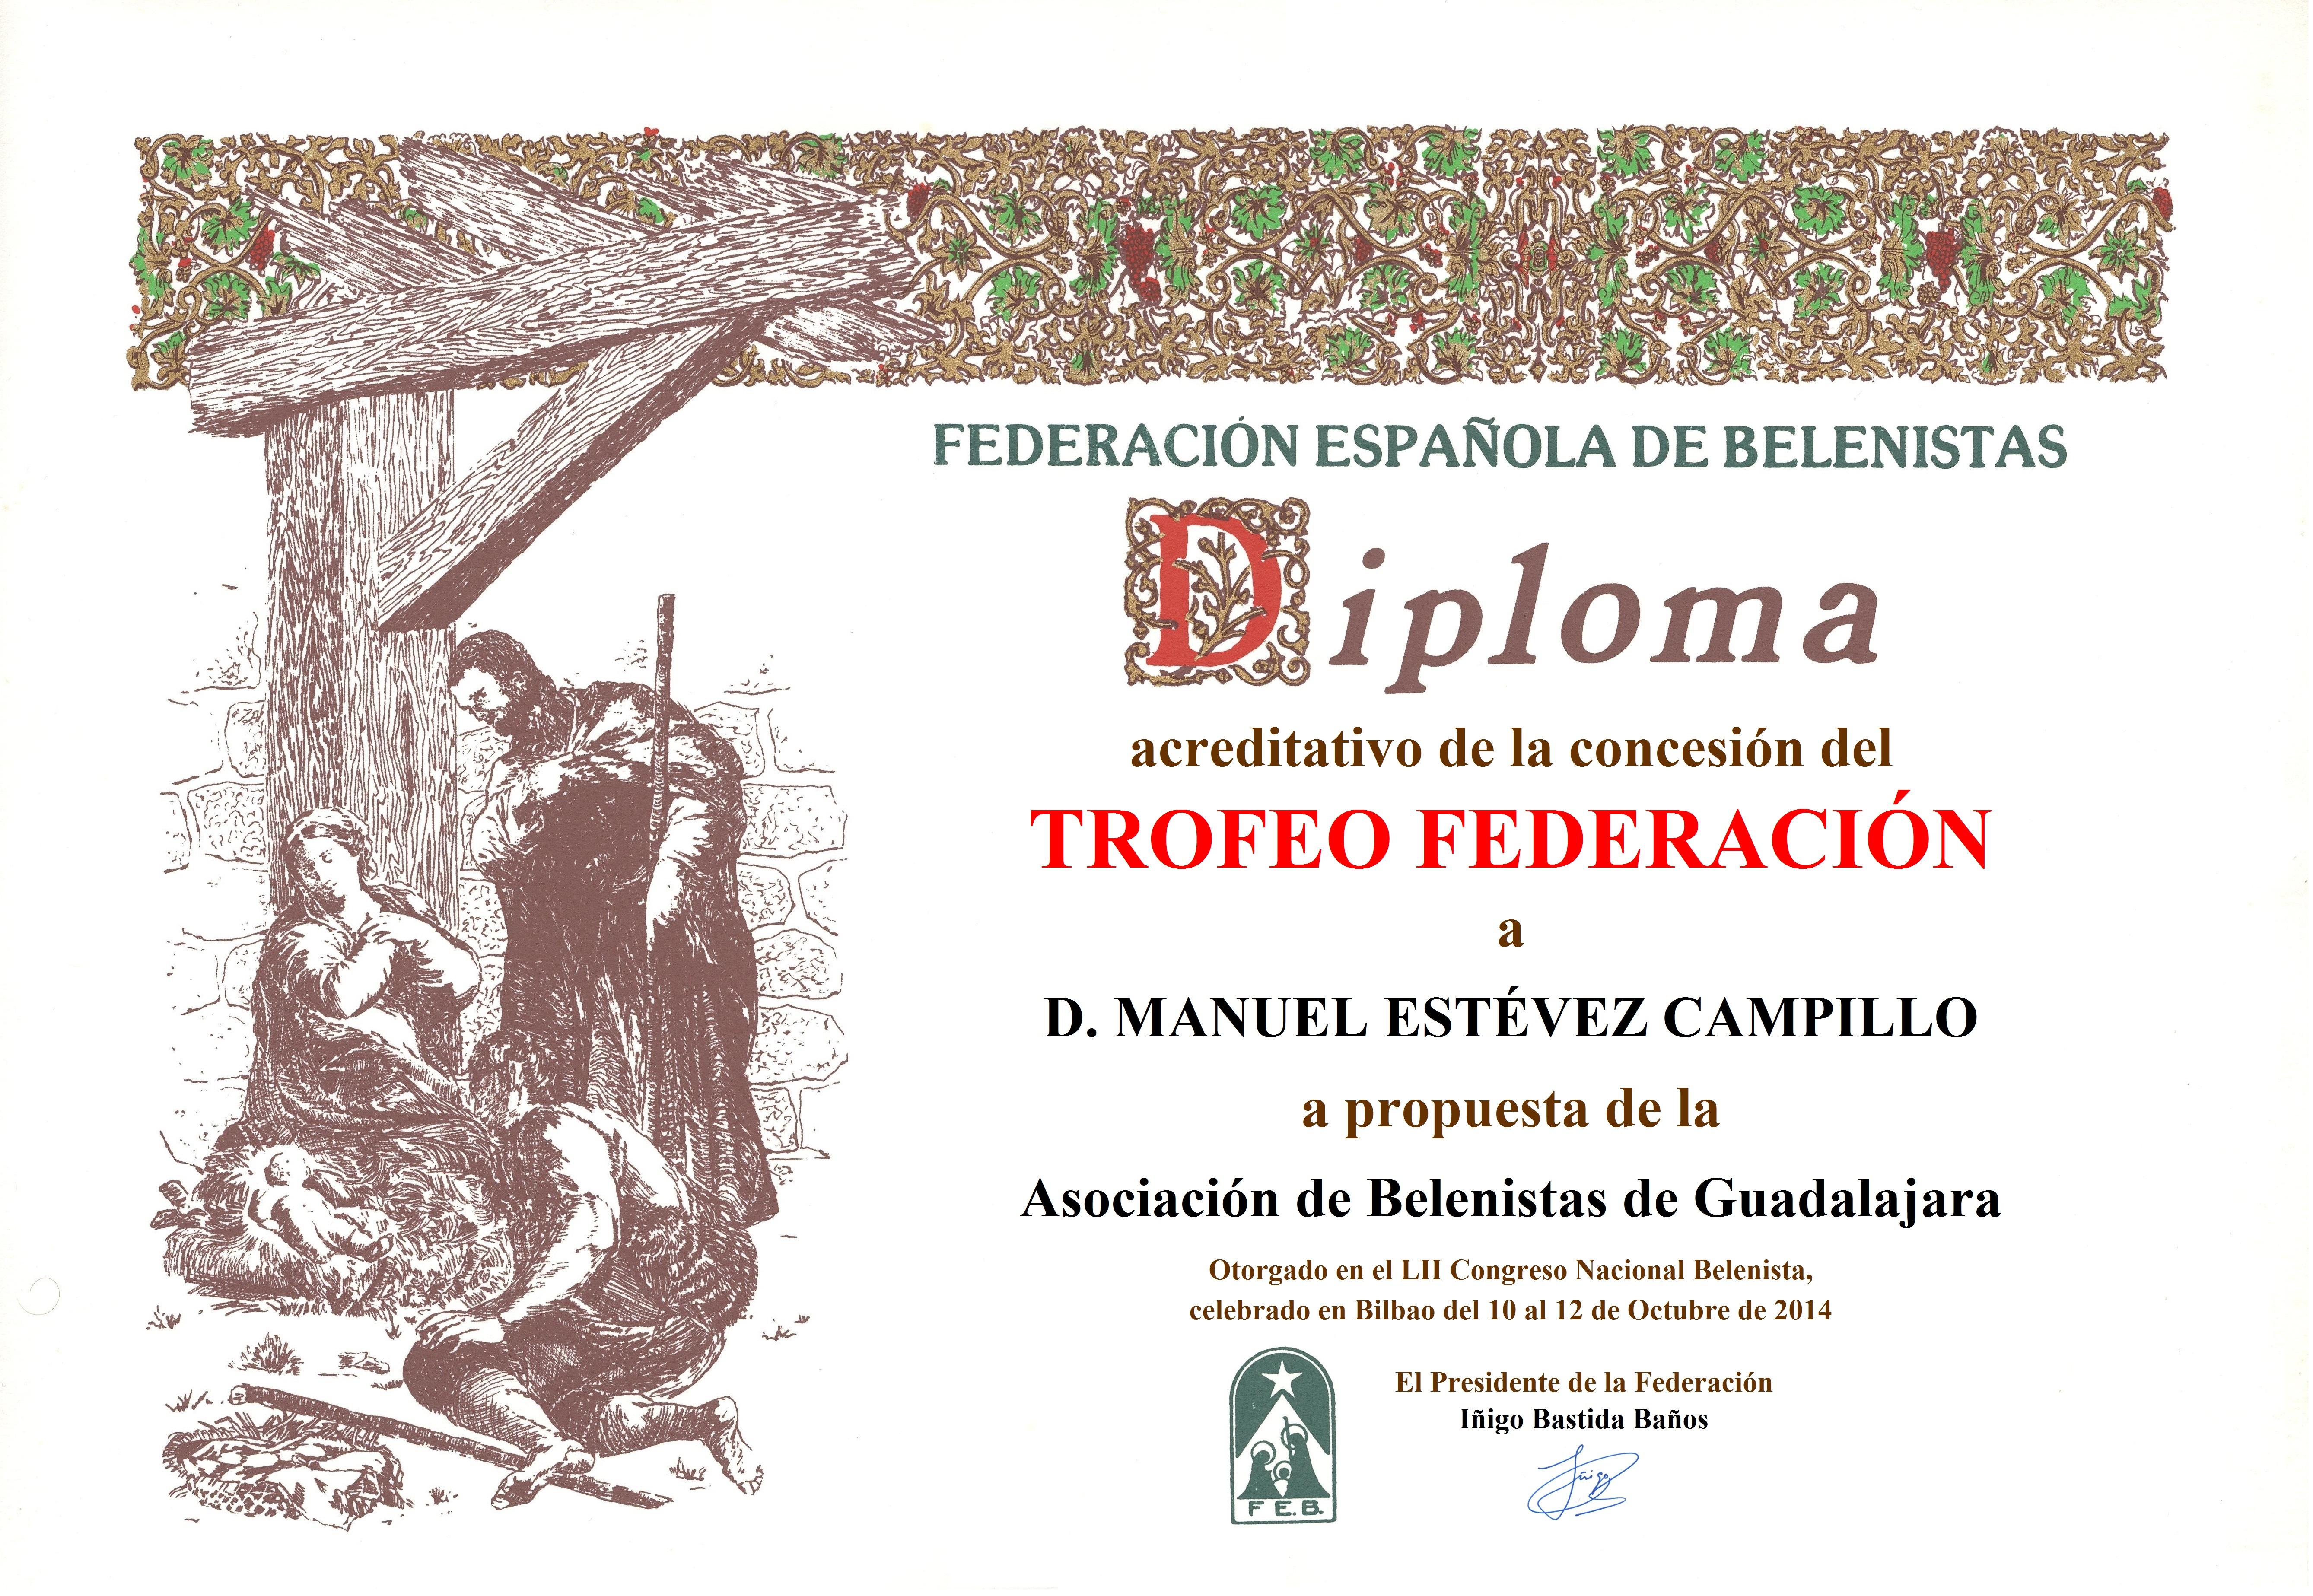 Diploma Trofeo FEB 2014 Manuel Estévez Campillo